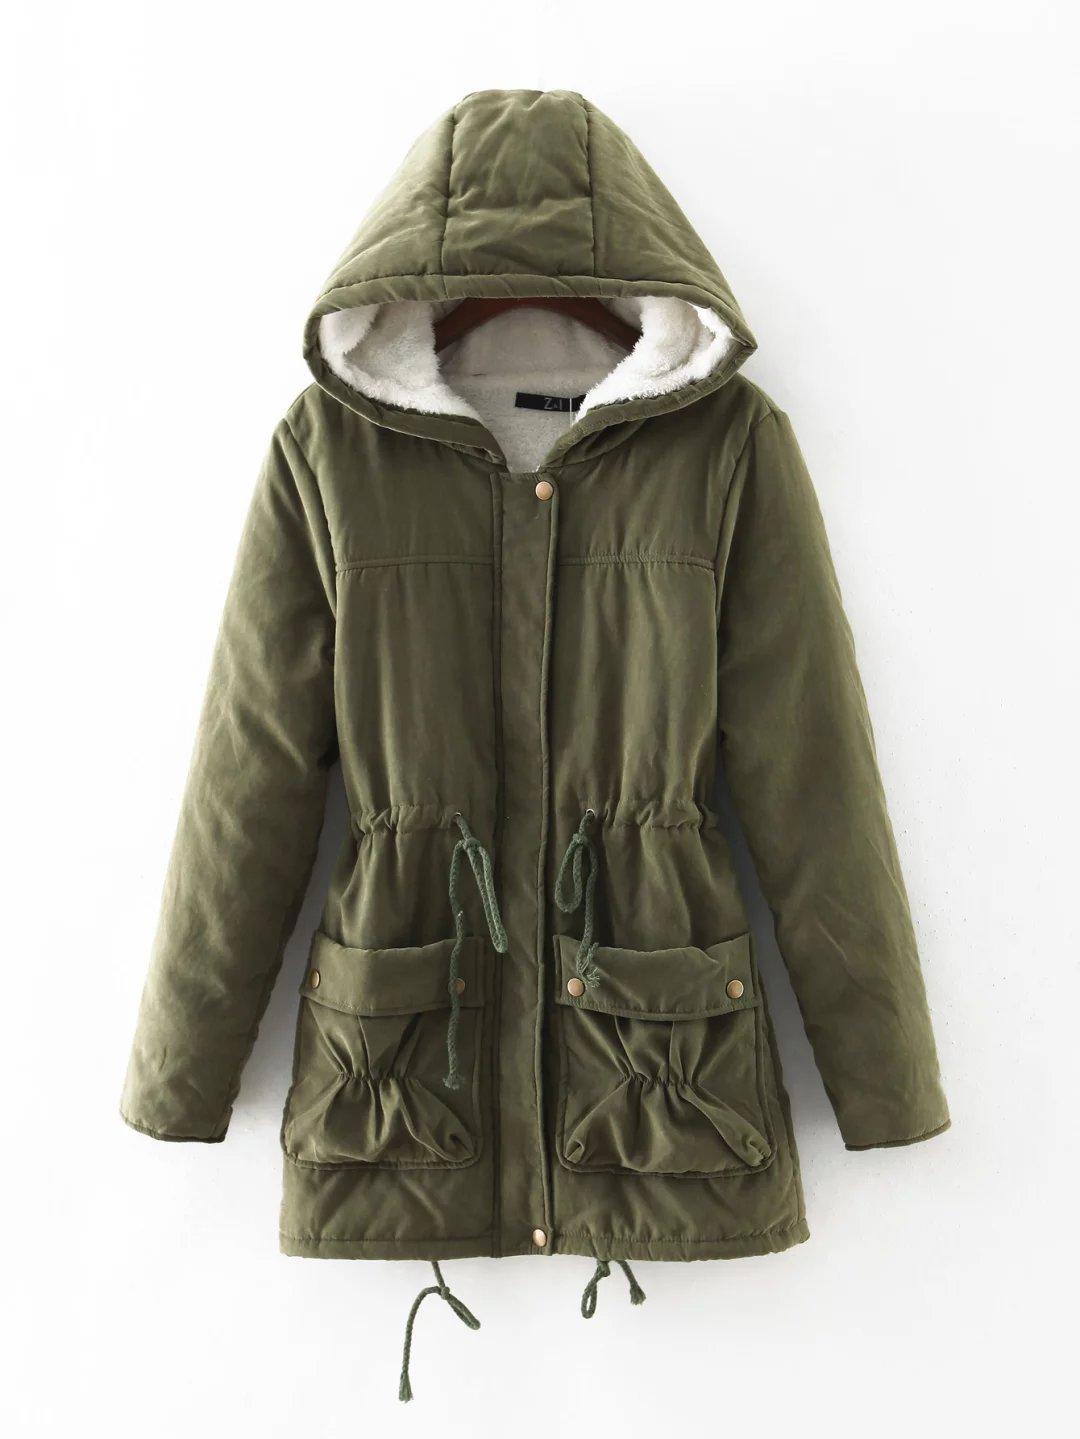 army Black Green Warm Casual Women navy Medium Outwear Padded Long Jackets Winter New Hooded pink Cotton Snow khaki Blue Parkas O6qR5